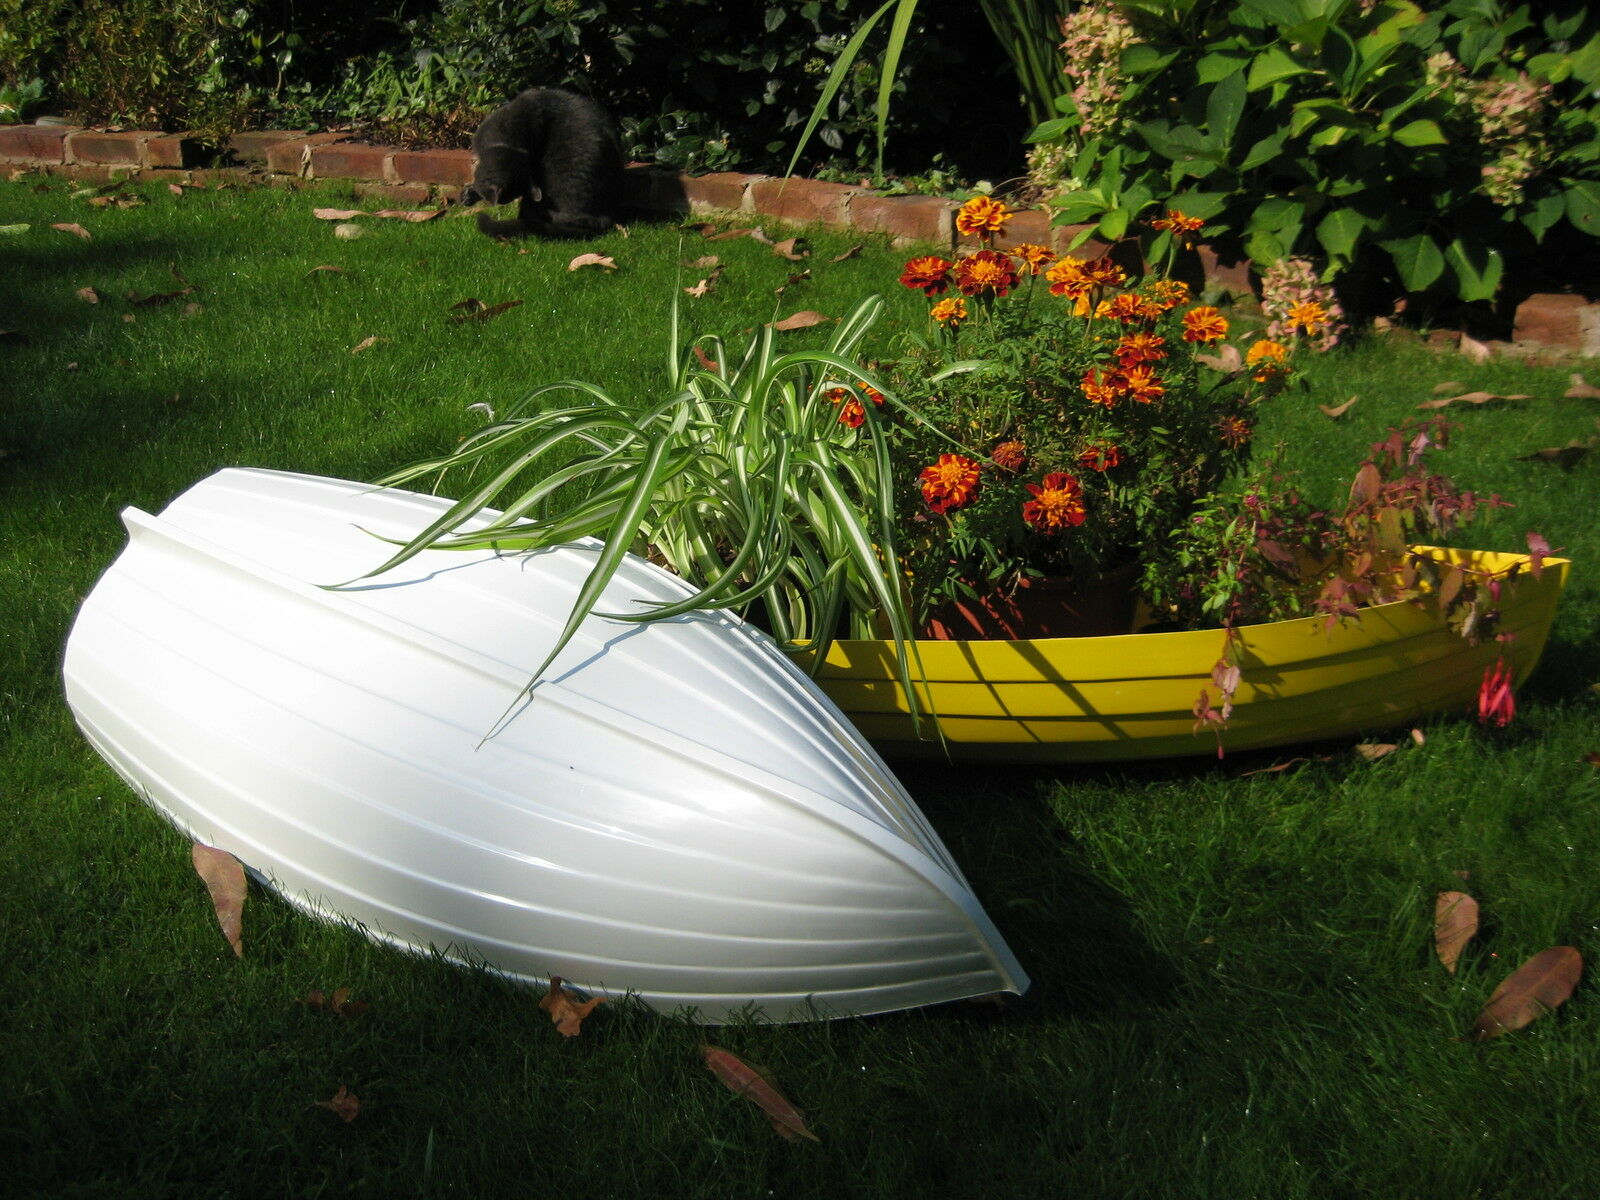 Grp Jardín clinker barco plantador